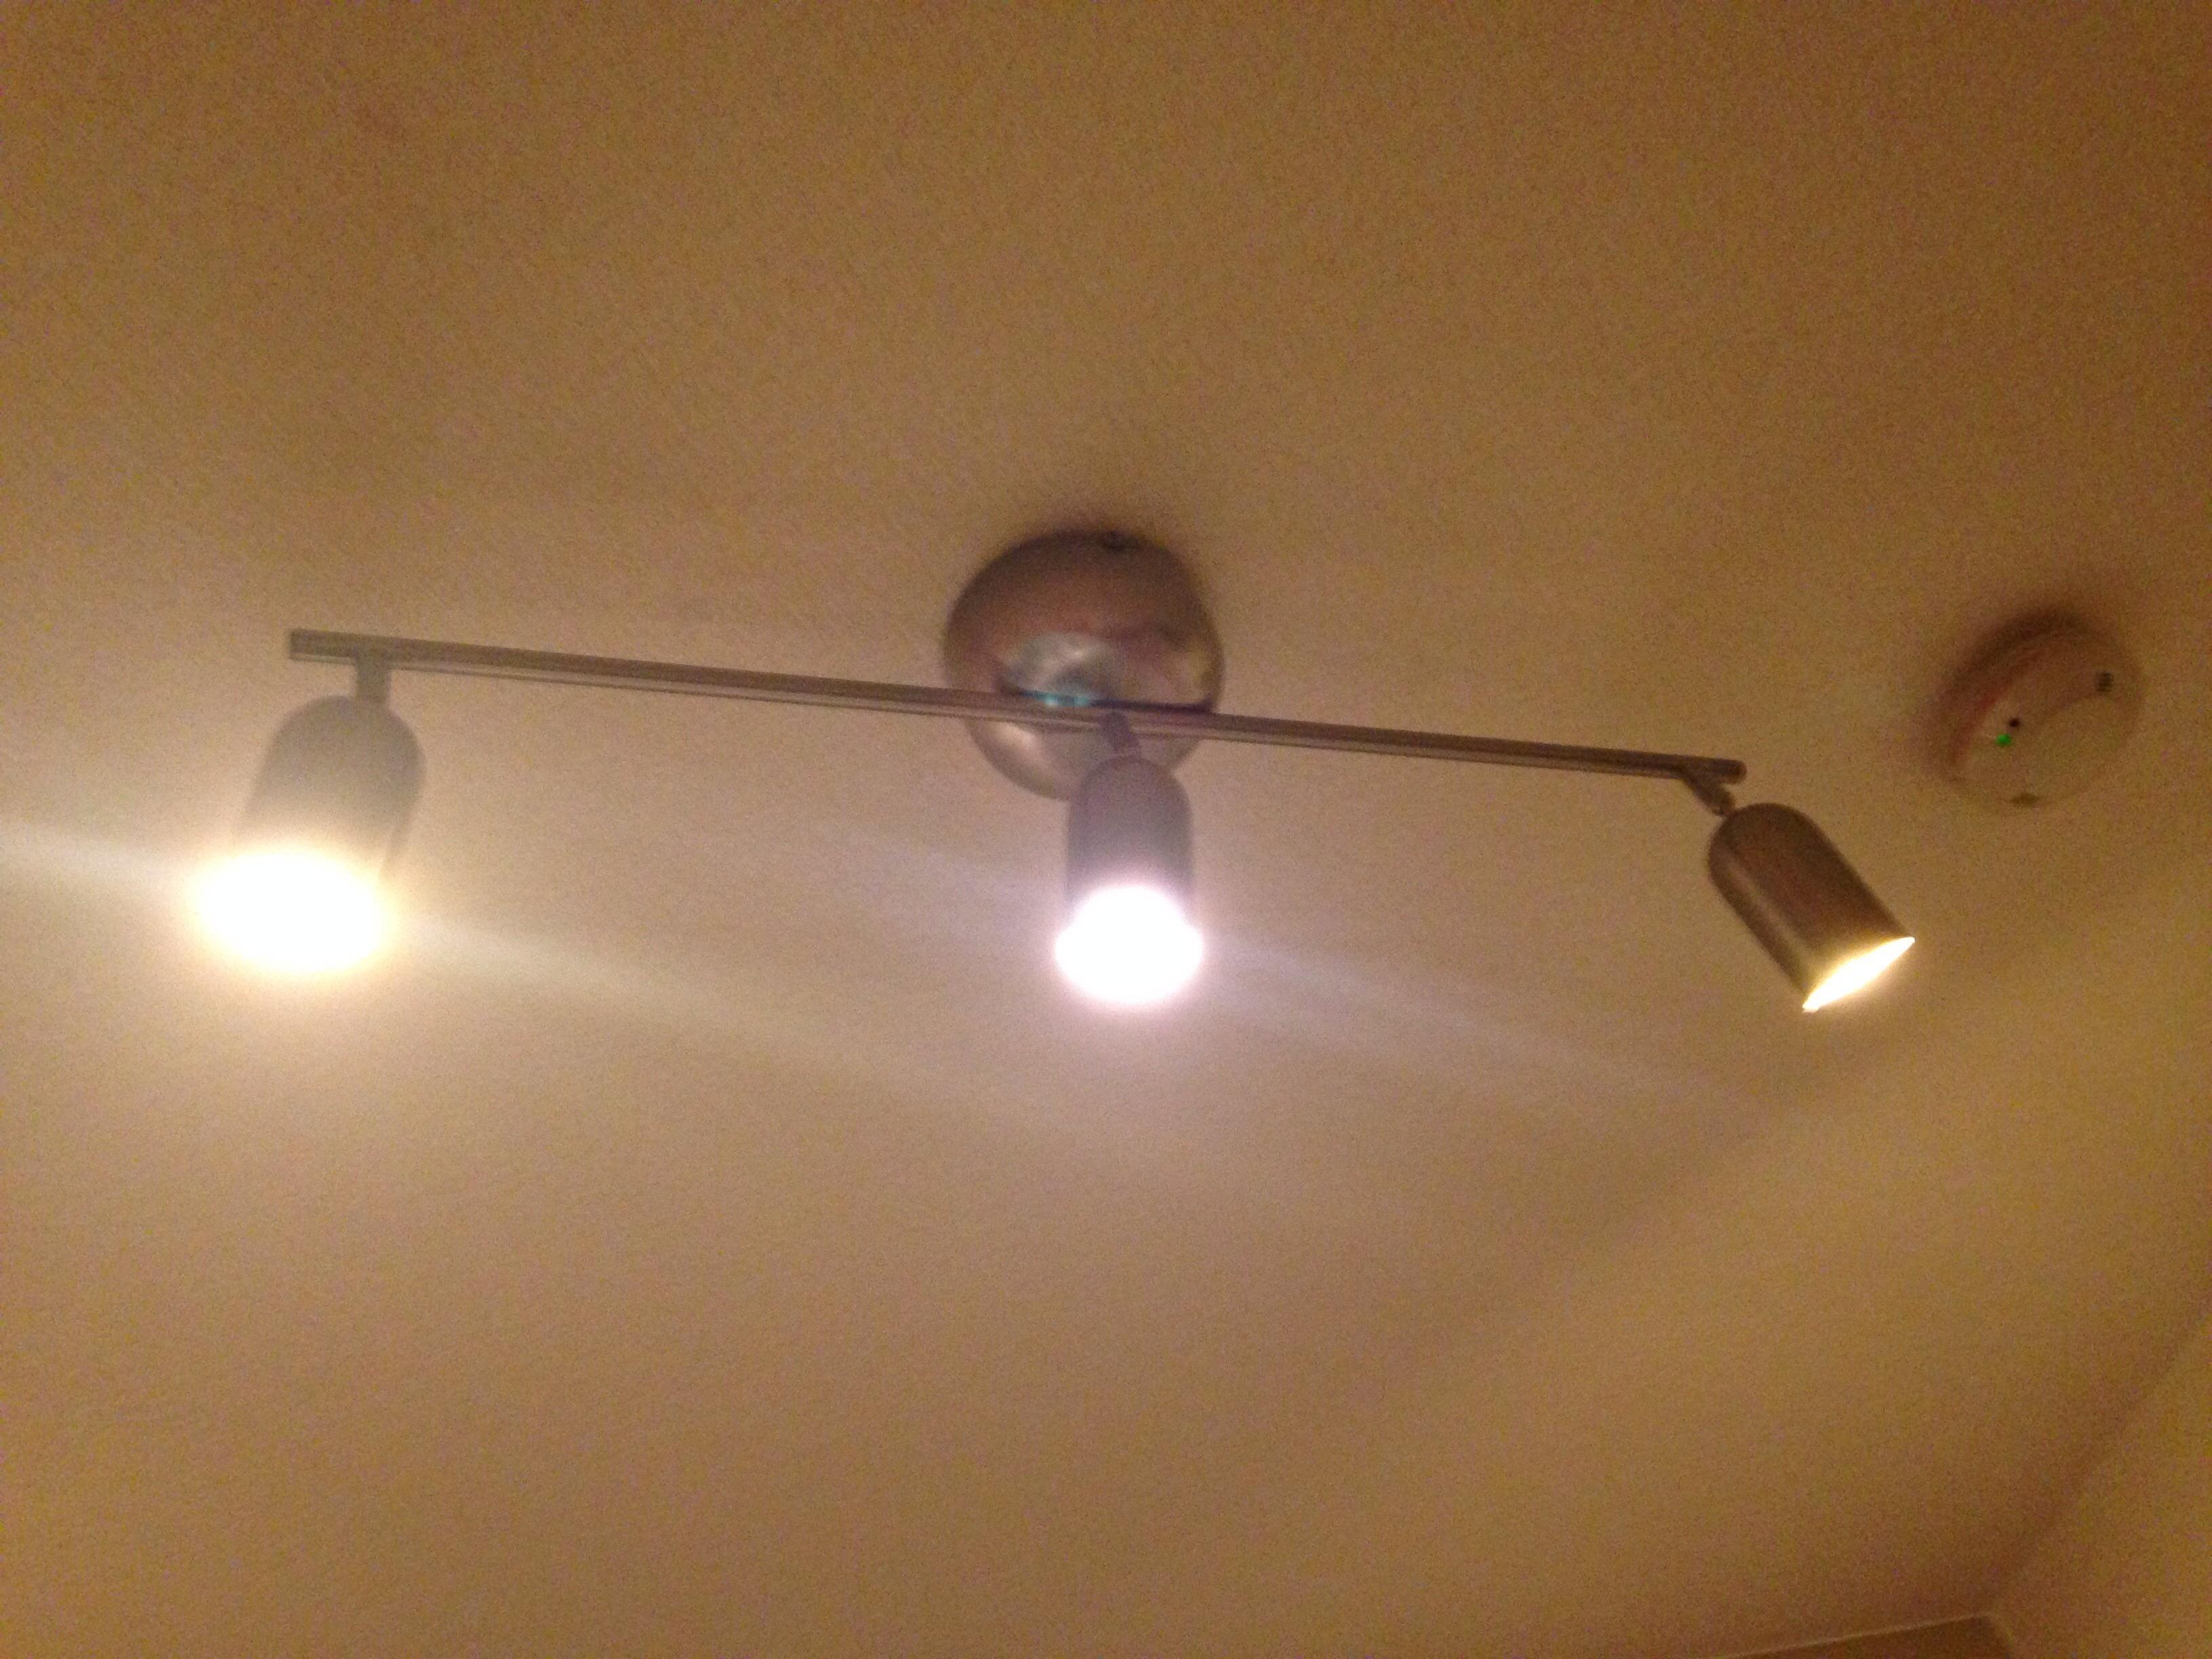 ikeaのシーリング電気について - 照明器具 解決済み| 【okwave】